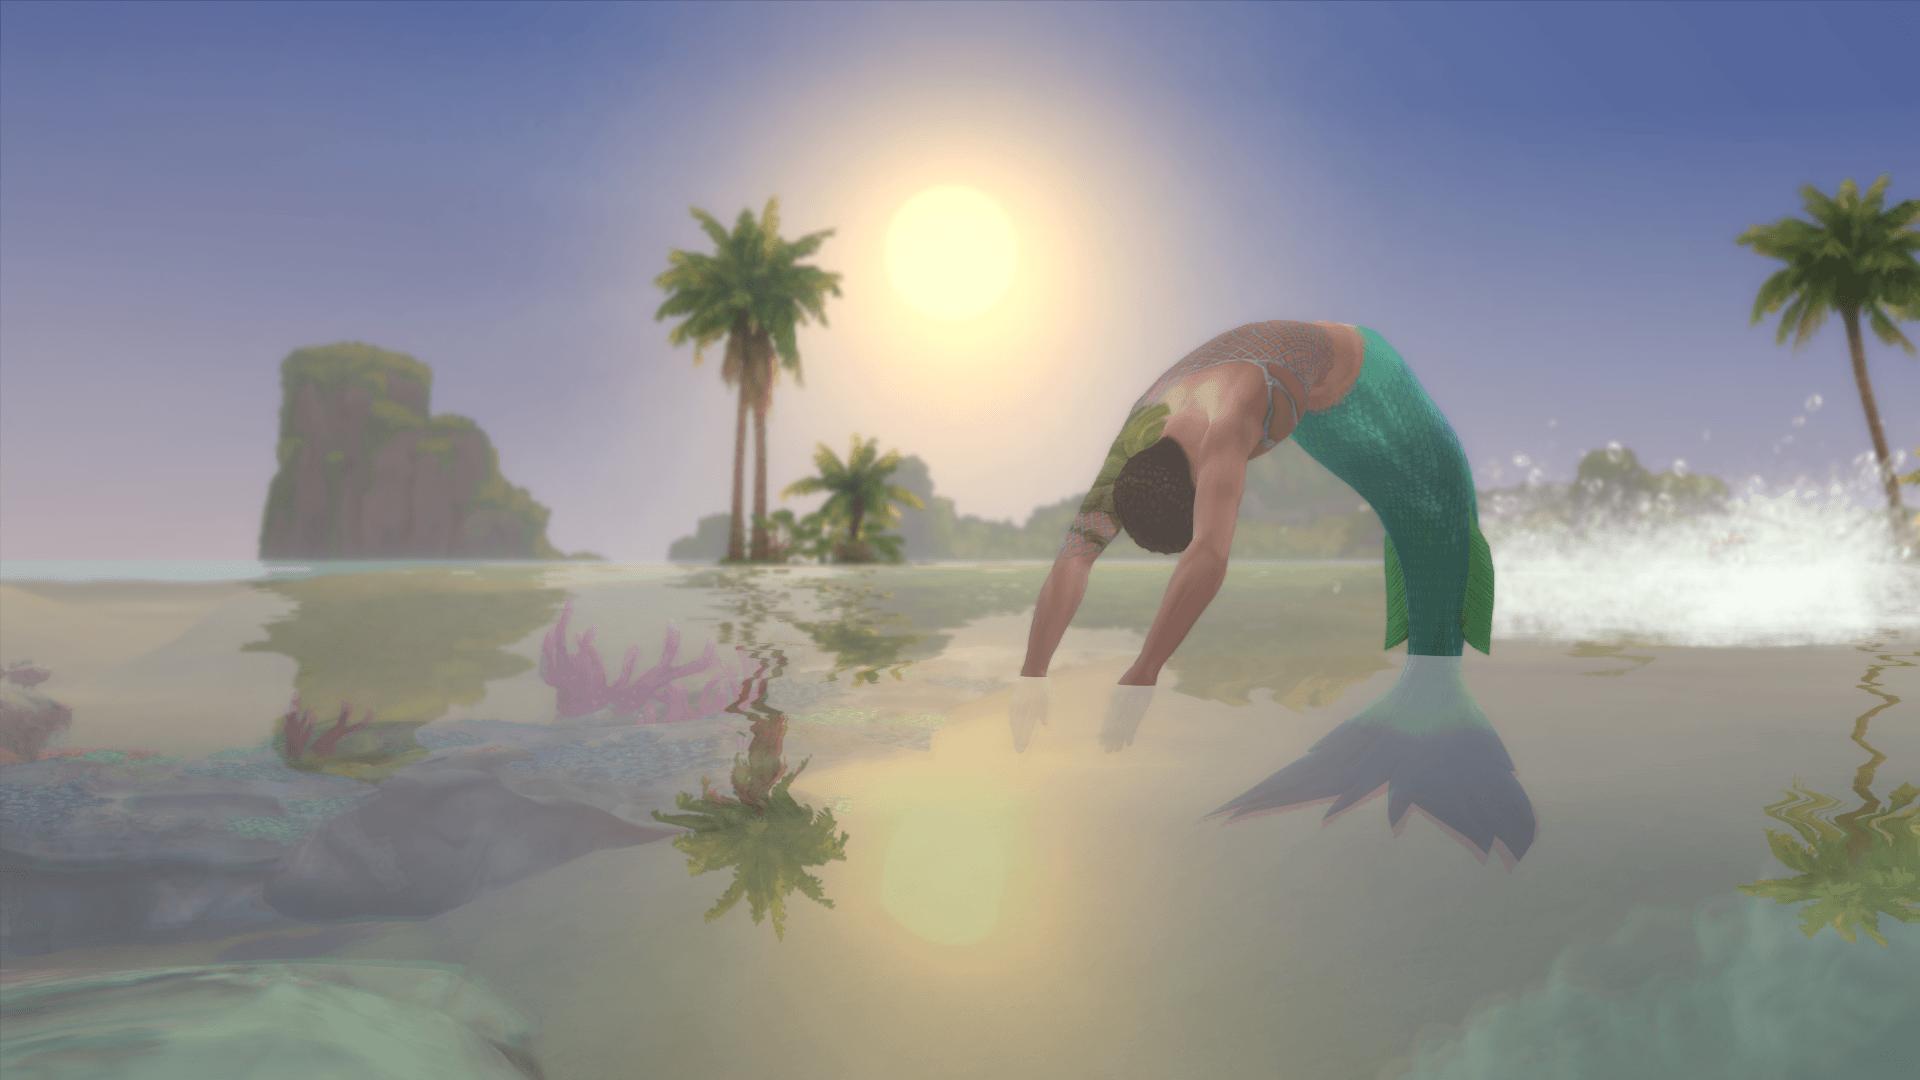 Sirène océan sims 4 iles paradisiaques